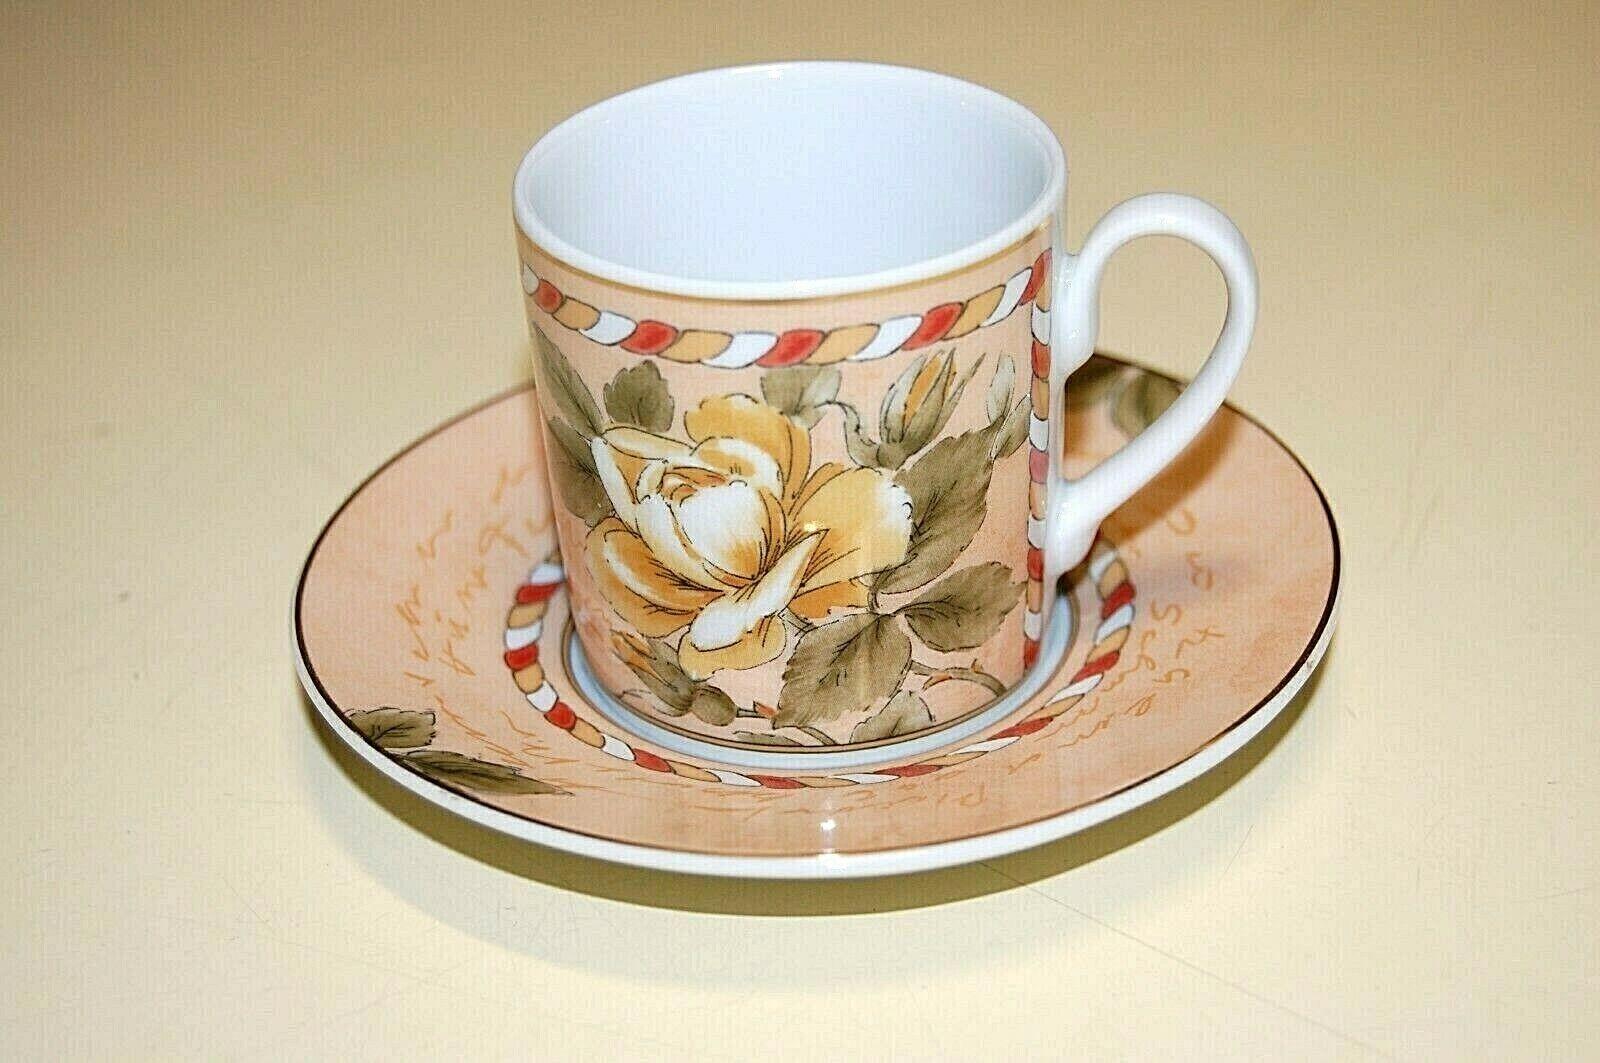 ROSENTHAL - Set 6 Tazze caffè c p RENAISSANCE ALLEGRA - Porcellana - NUOVO